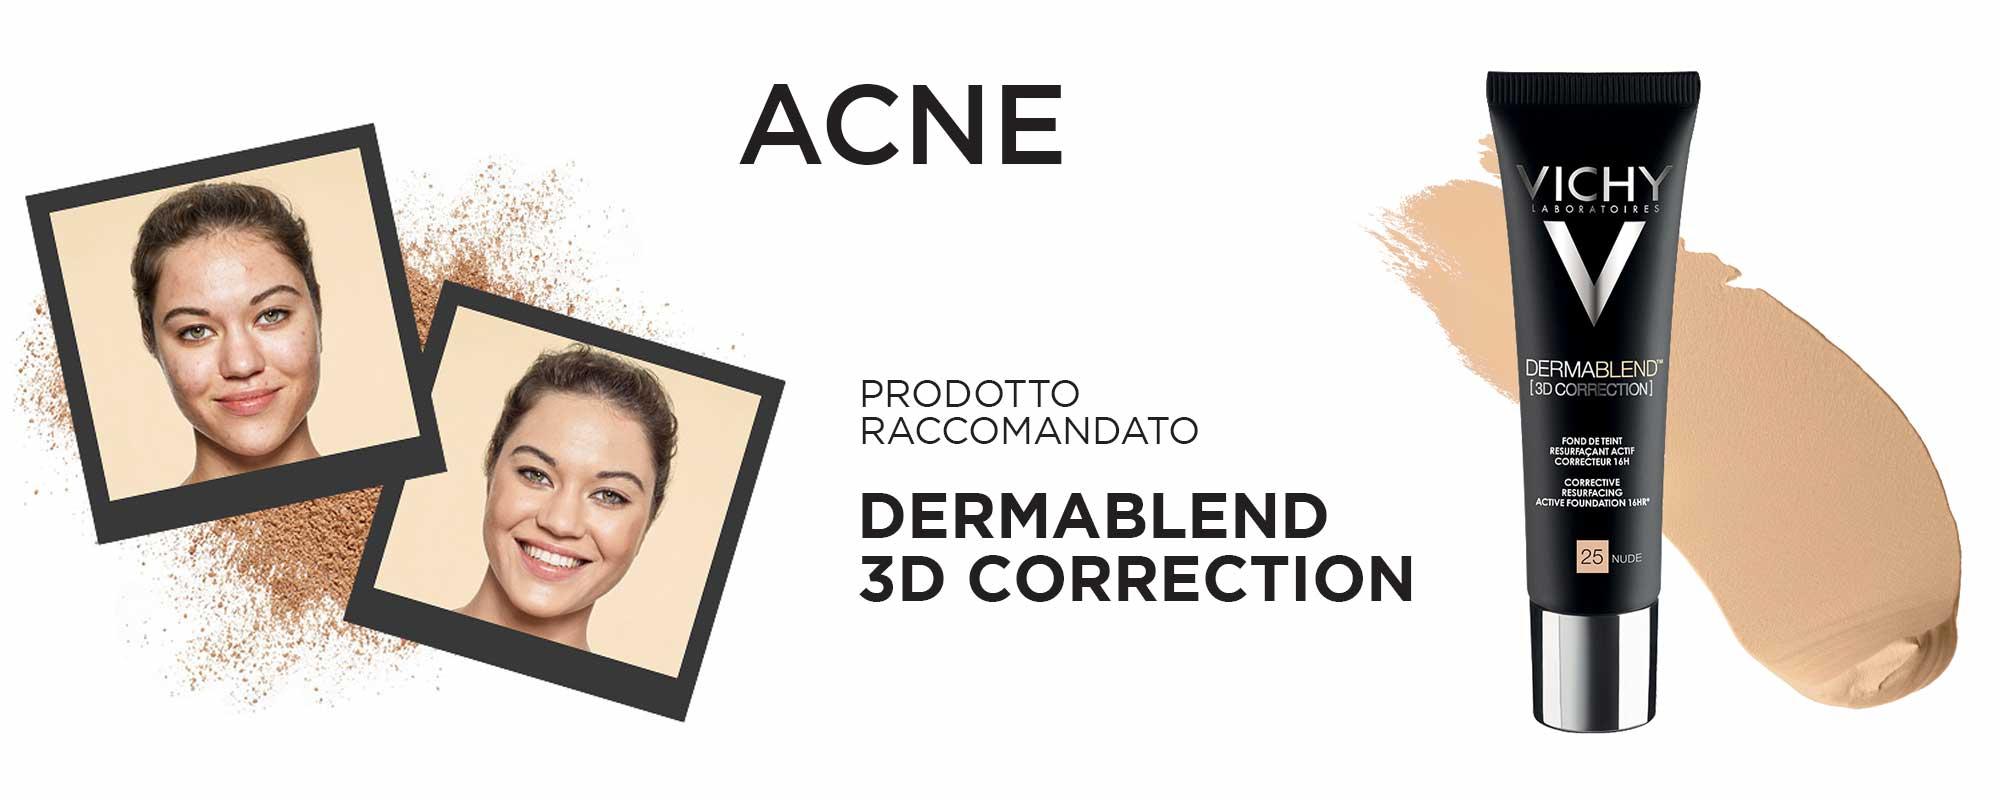 acne vichy